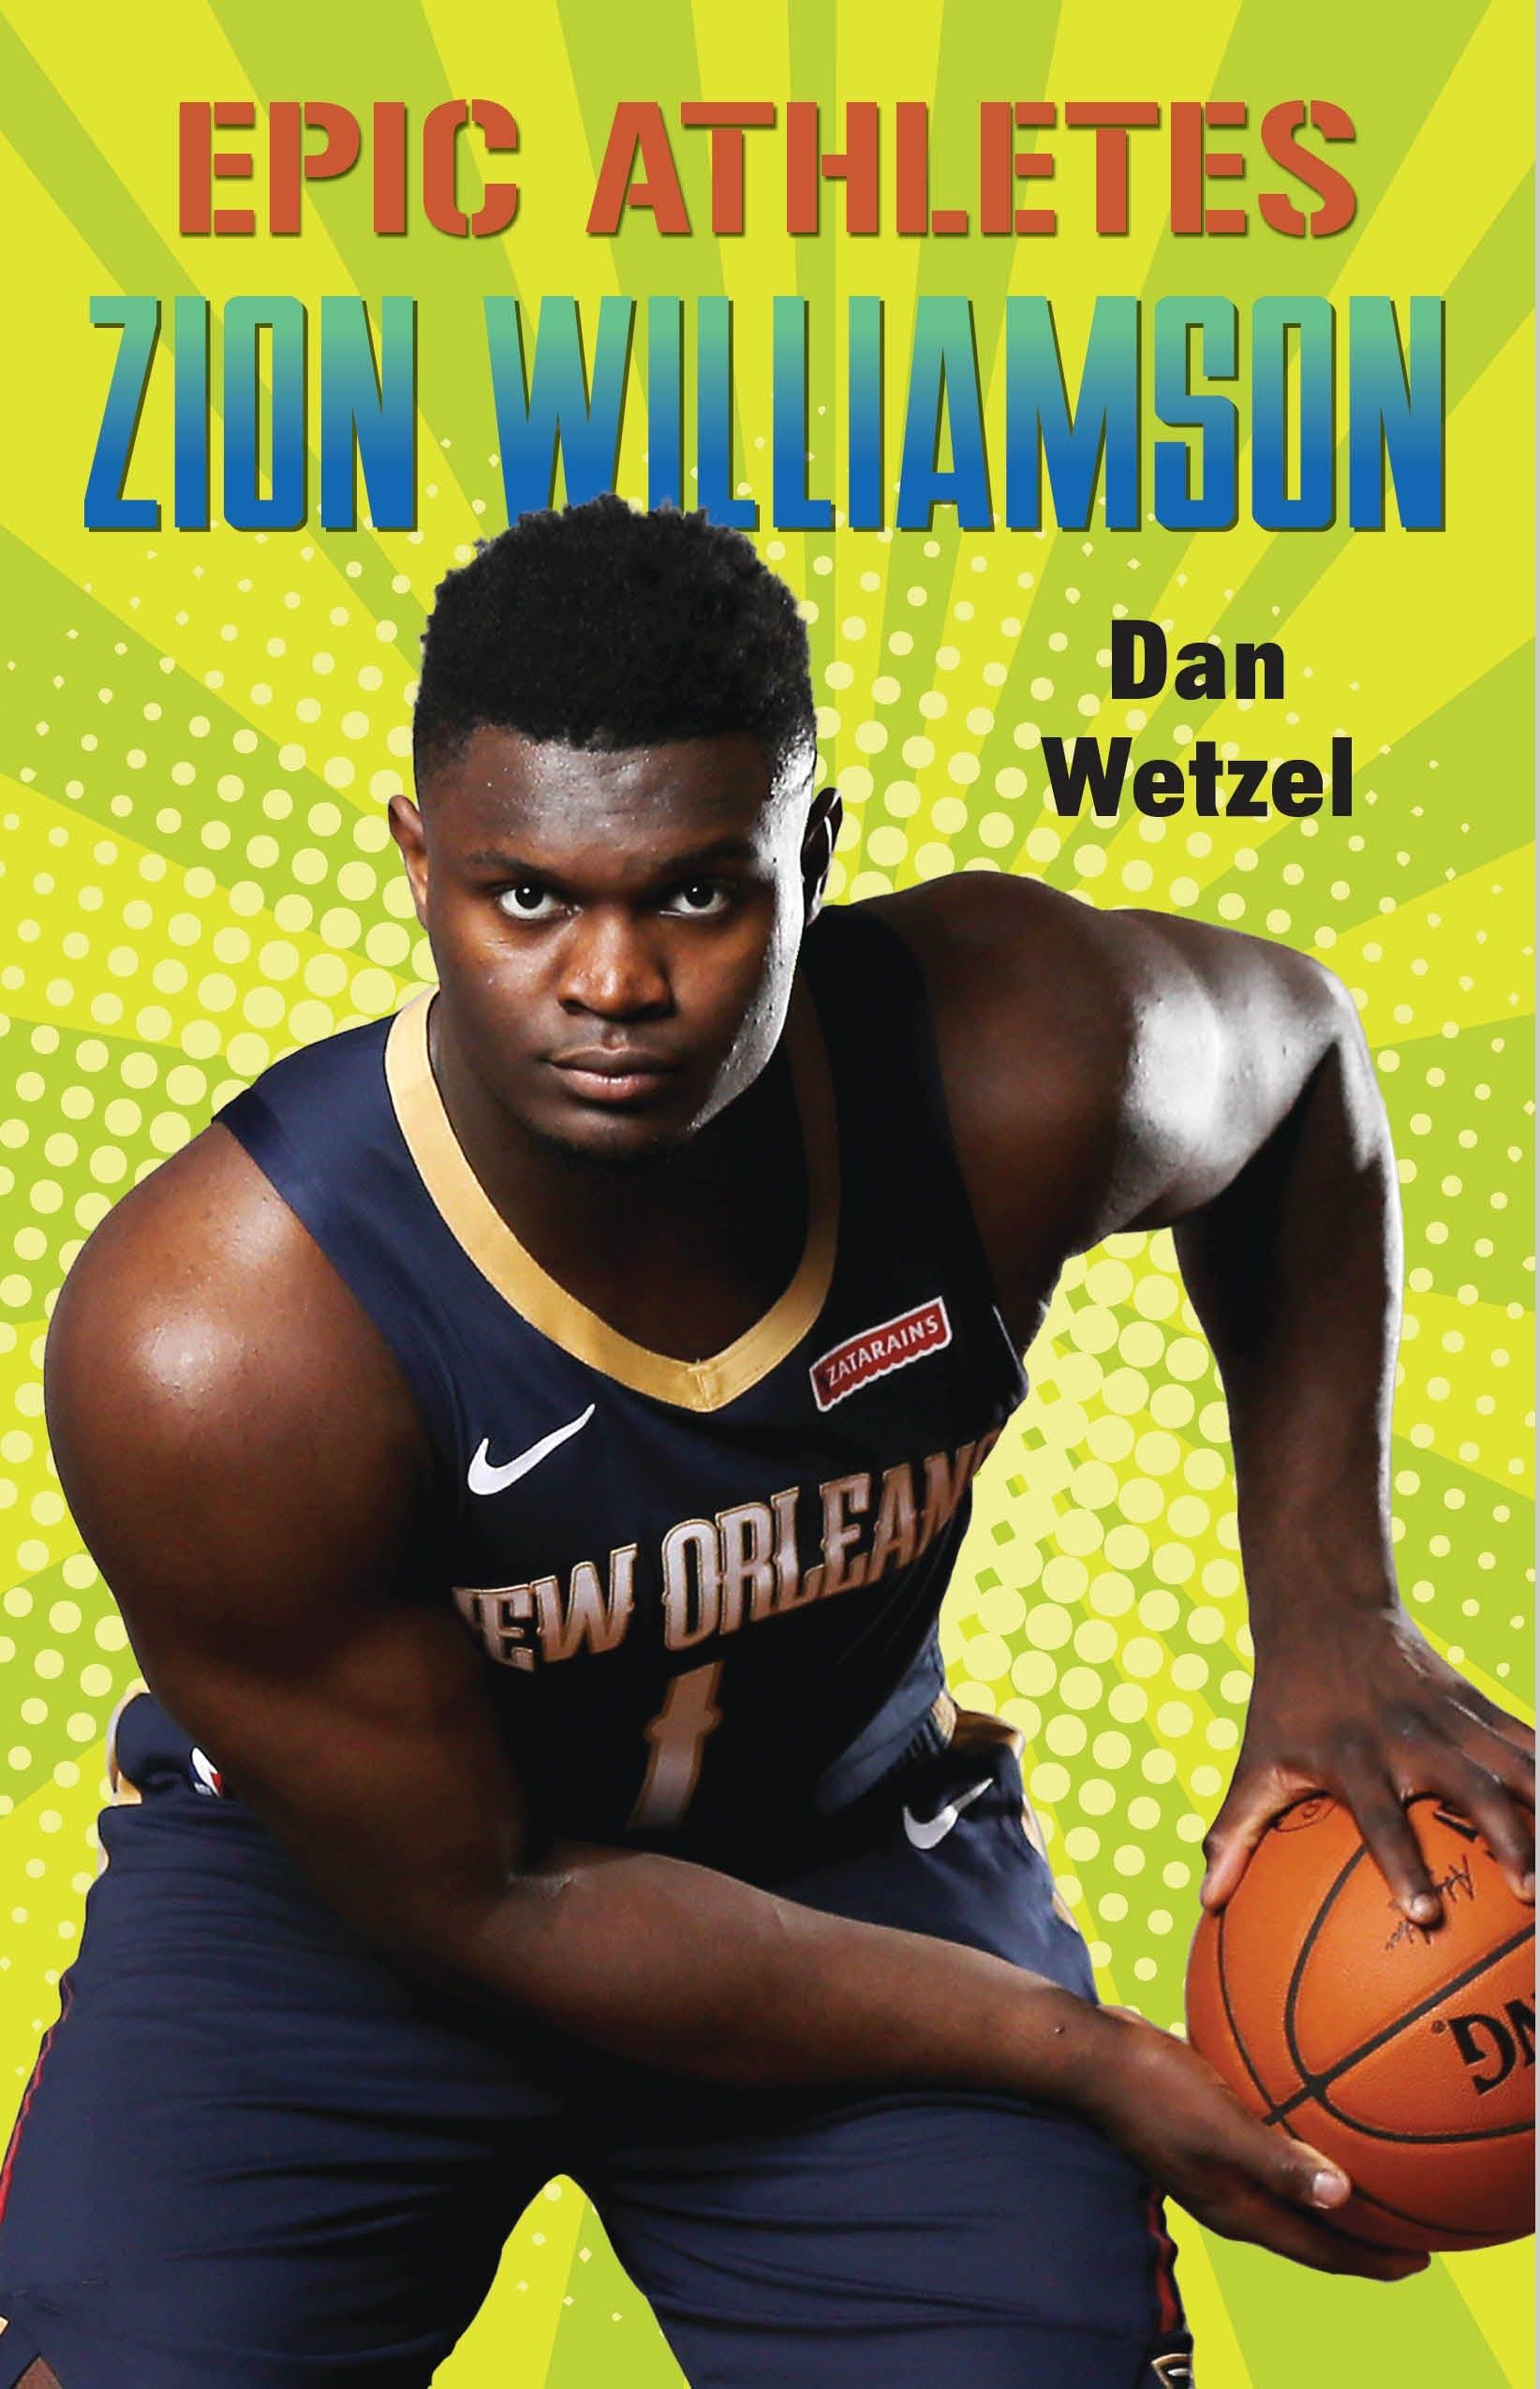 Image of Epic Athletes: Zion Williamson